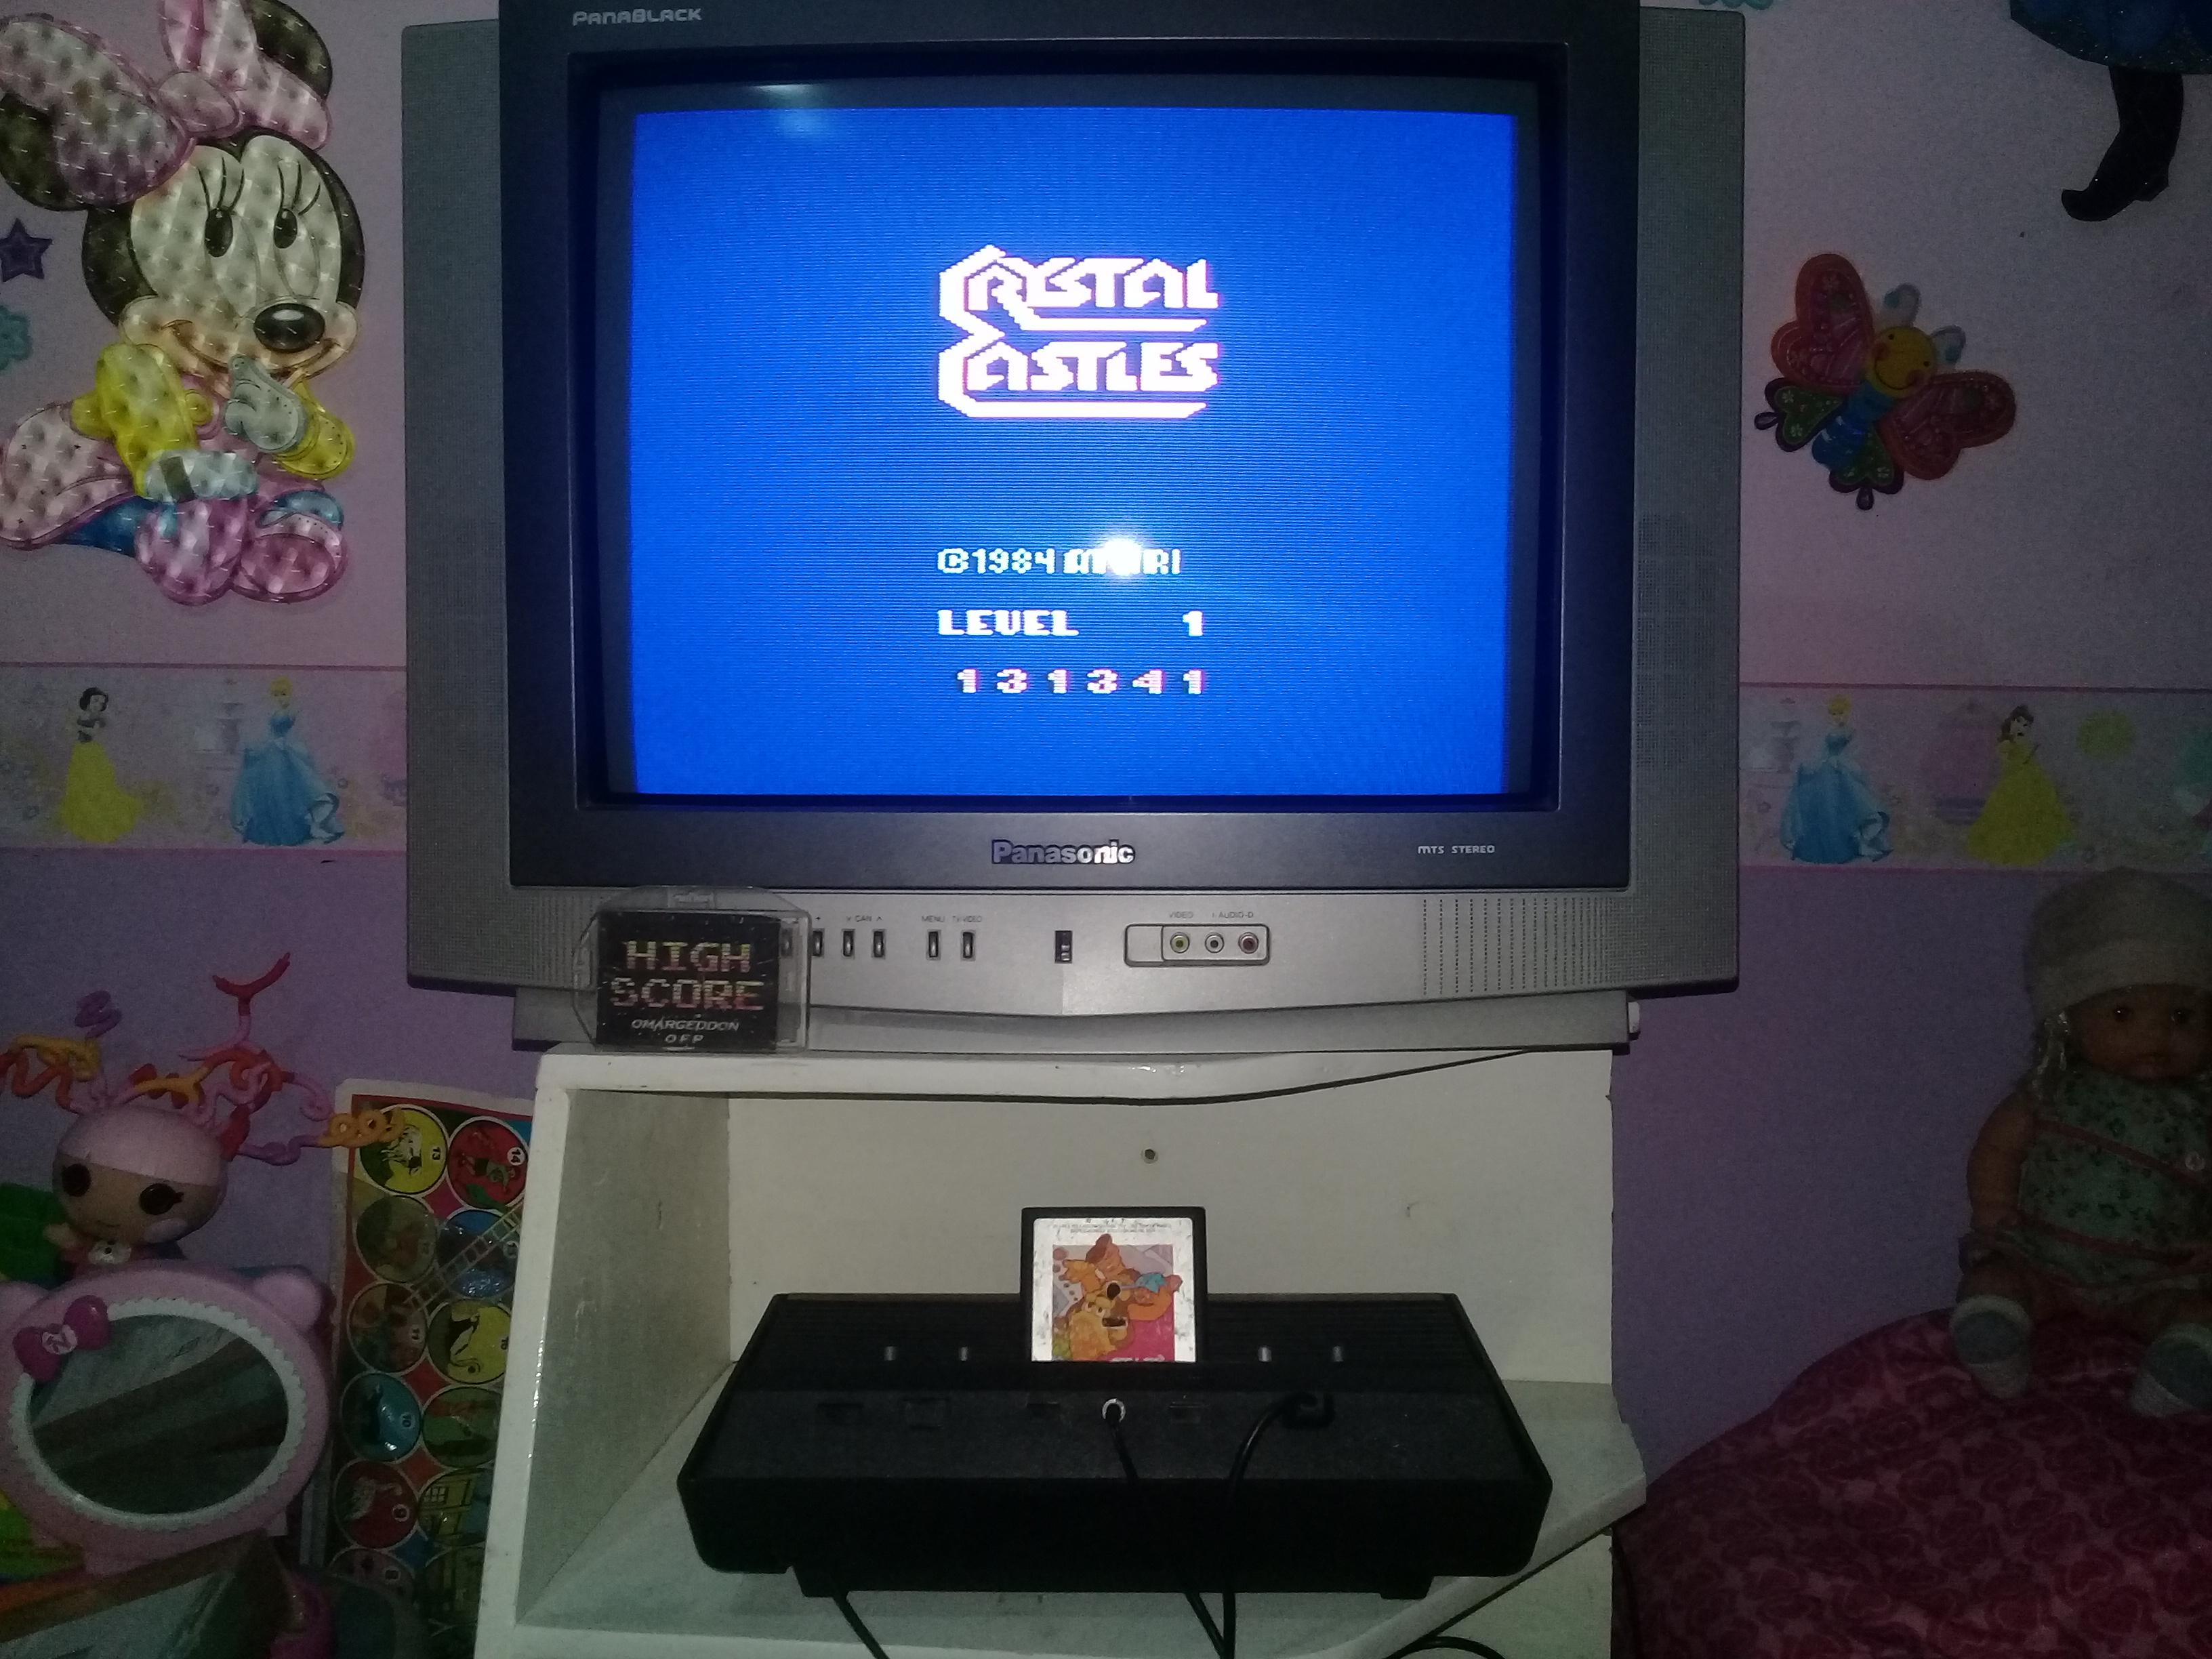 omargeddon: Crystal Castles (Atari 2600 Novice/B) 131,341 points on 2019-06-28 19:31:27